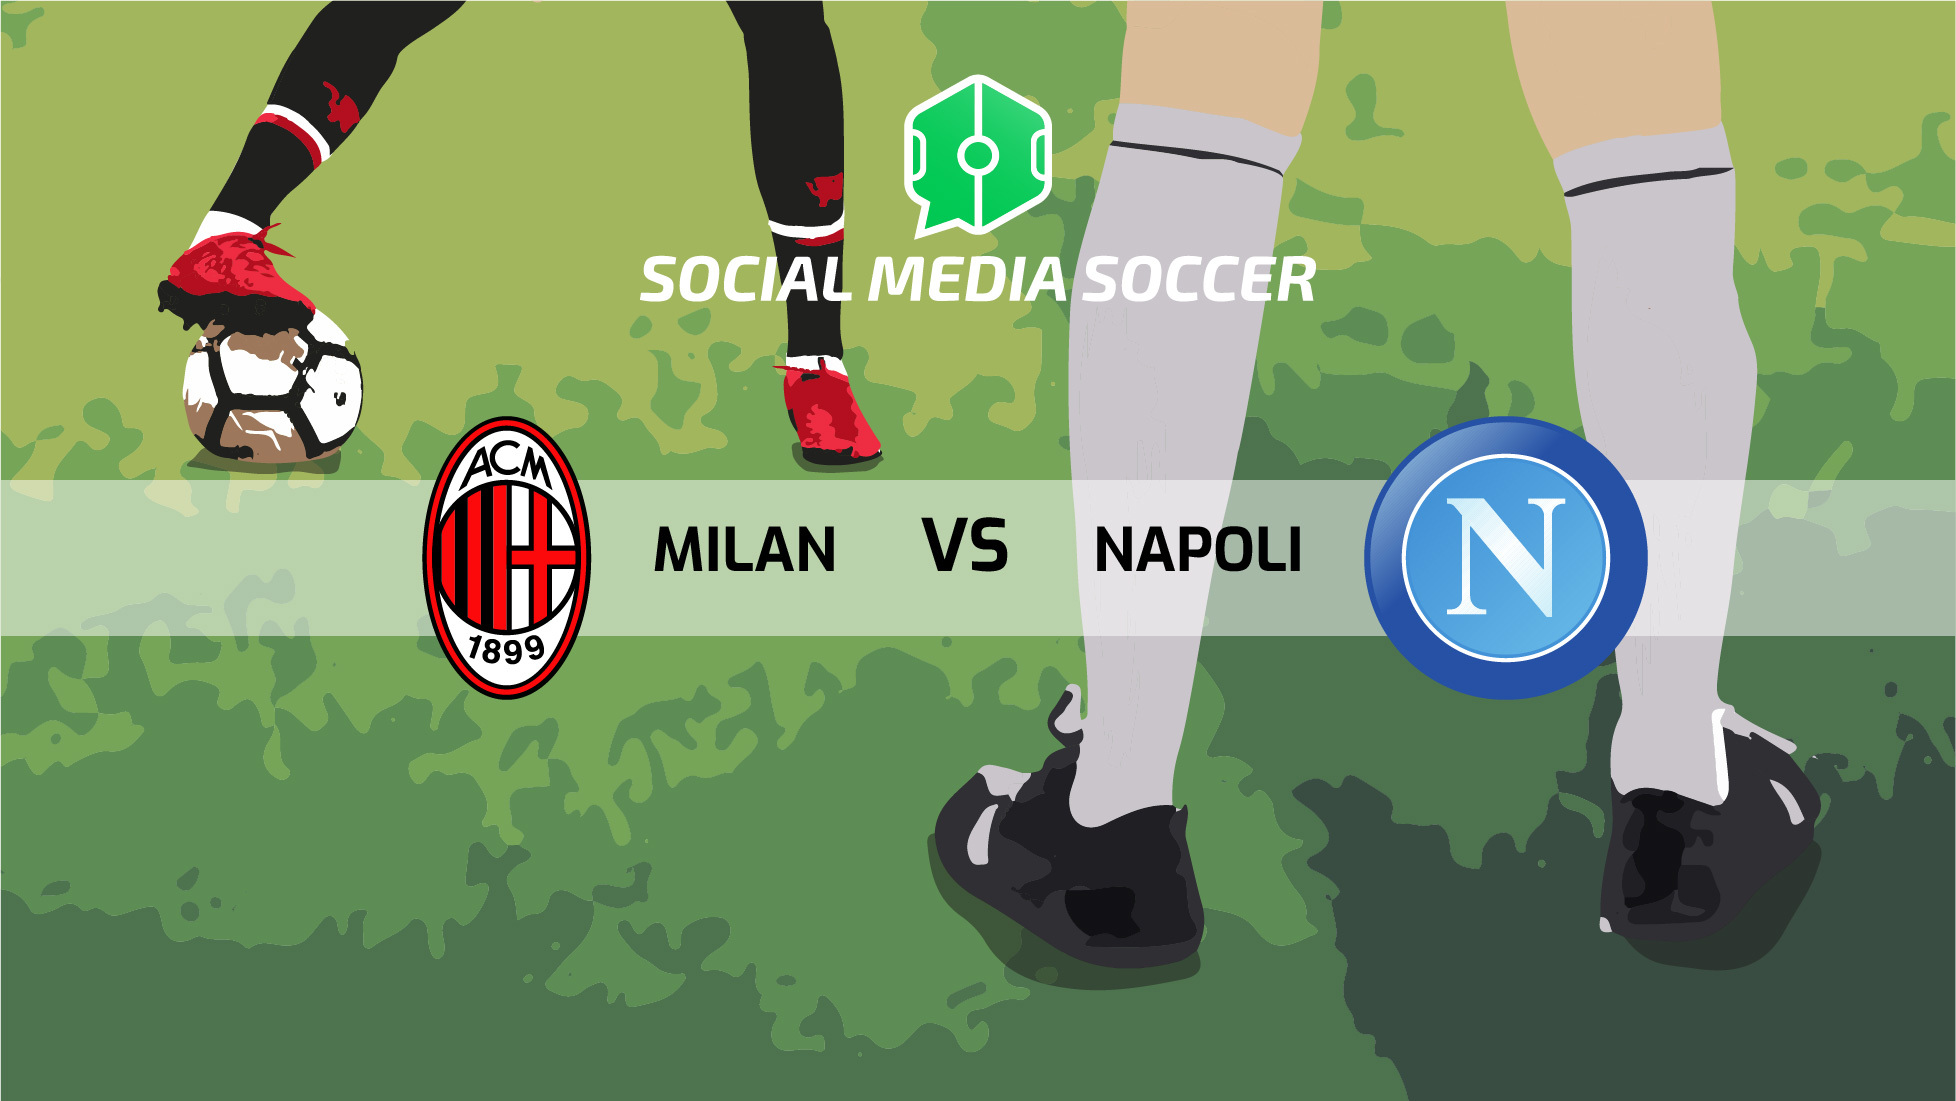 Milan-Napoli Social